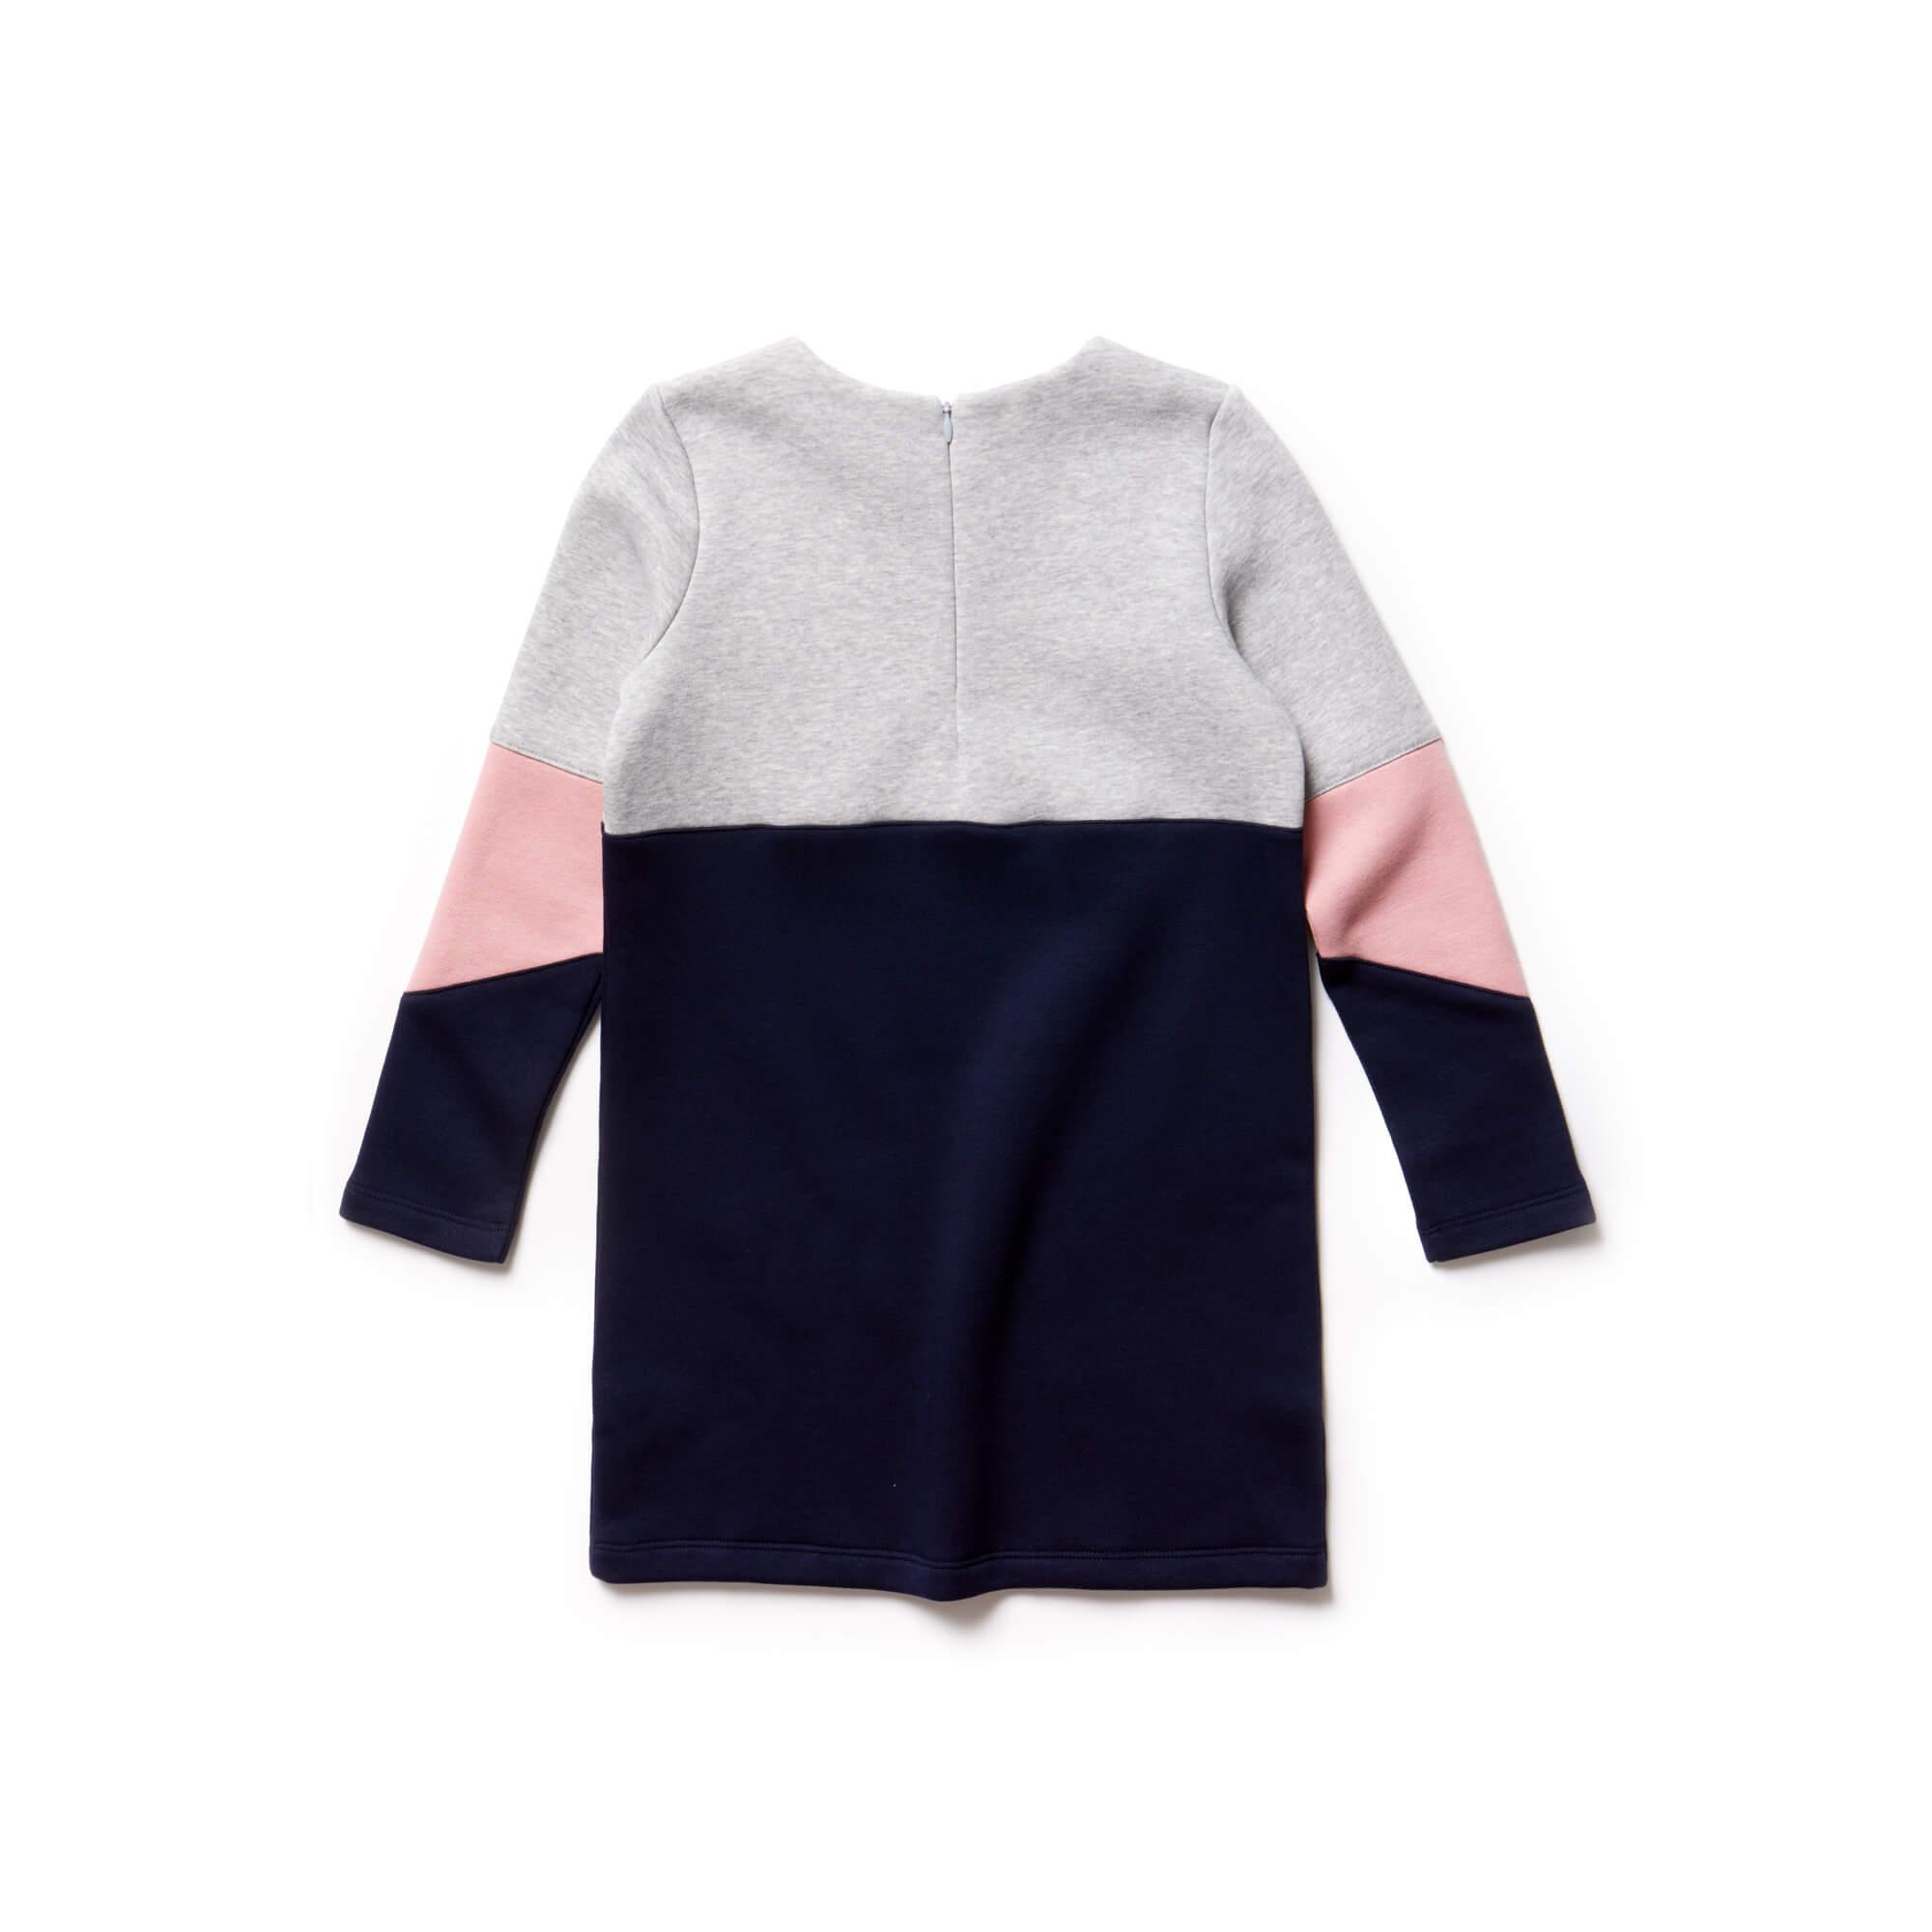 Lacoste Çocuk Lacivert-Gri Elbise